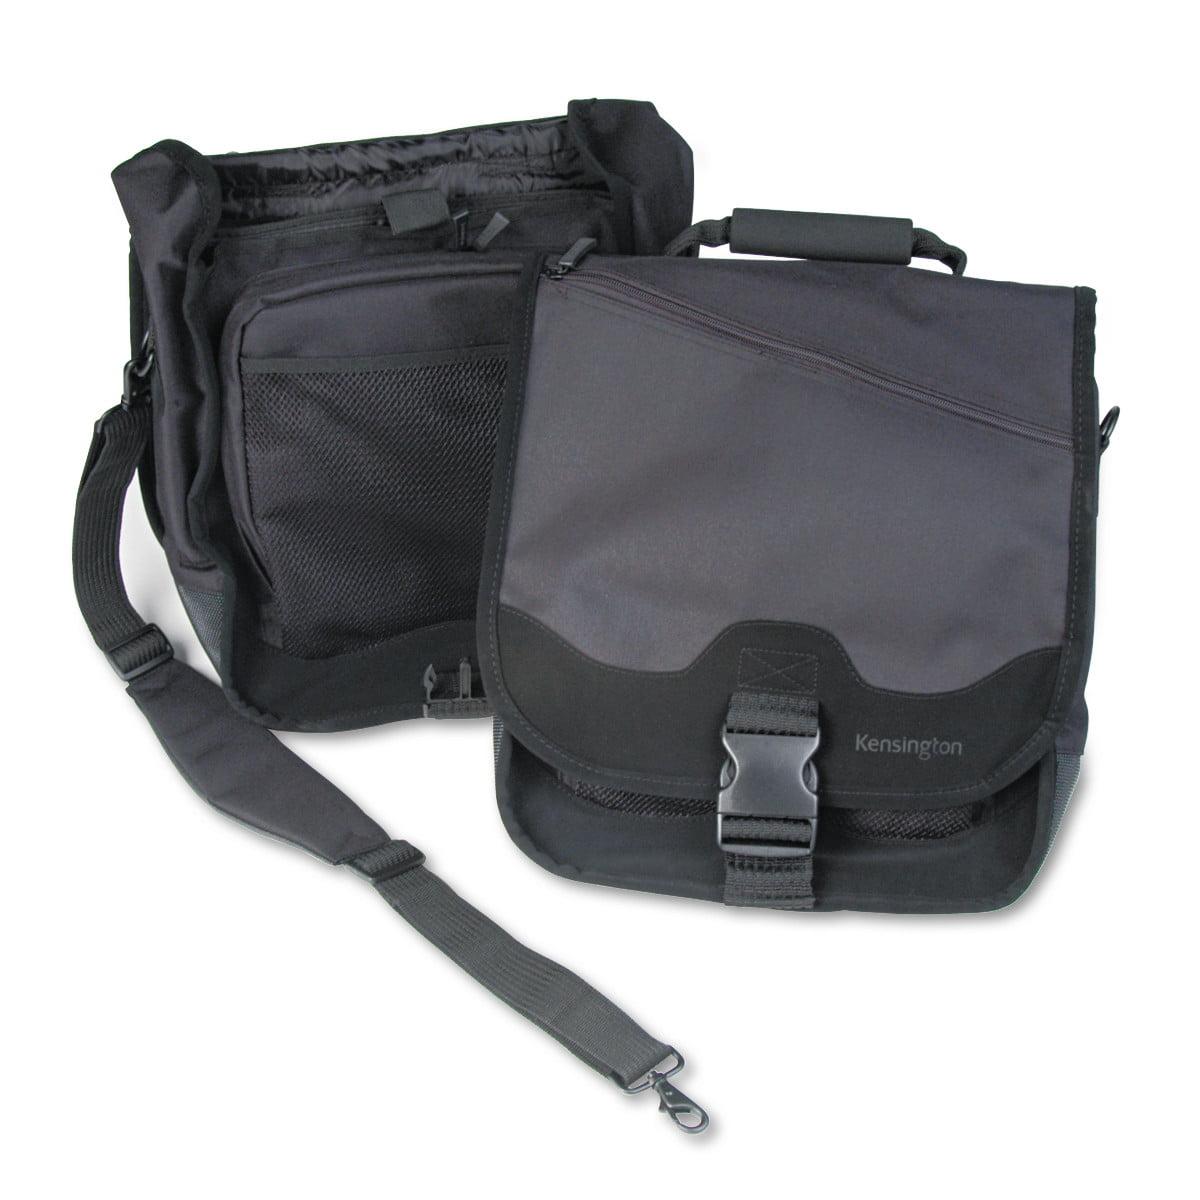 Kensington SaddleBag Laptop Carrying Case, 14-1 4 x 6-1 2 x 16-1 2, Black by Kensington